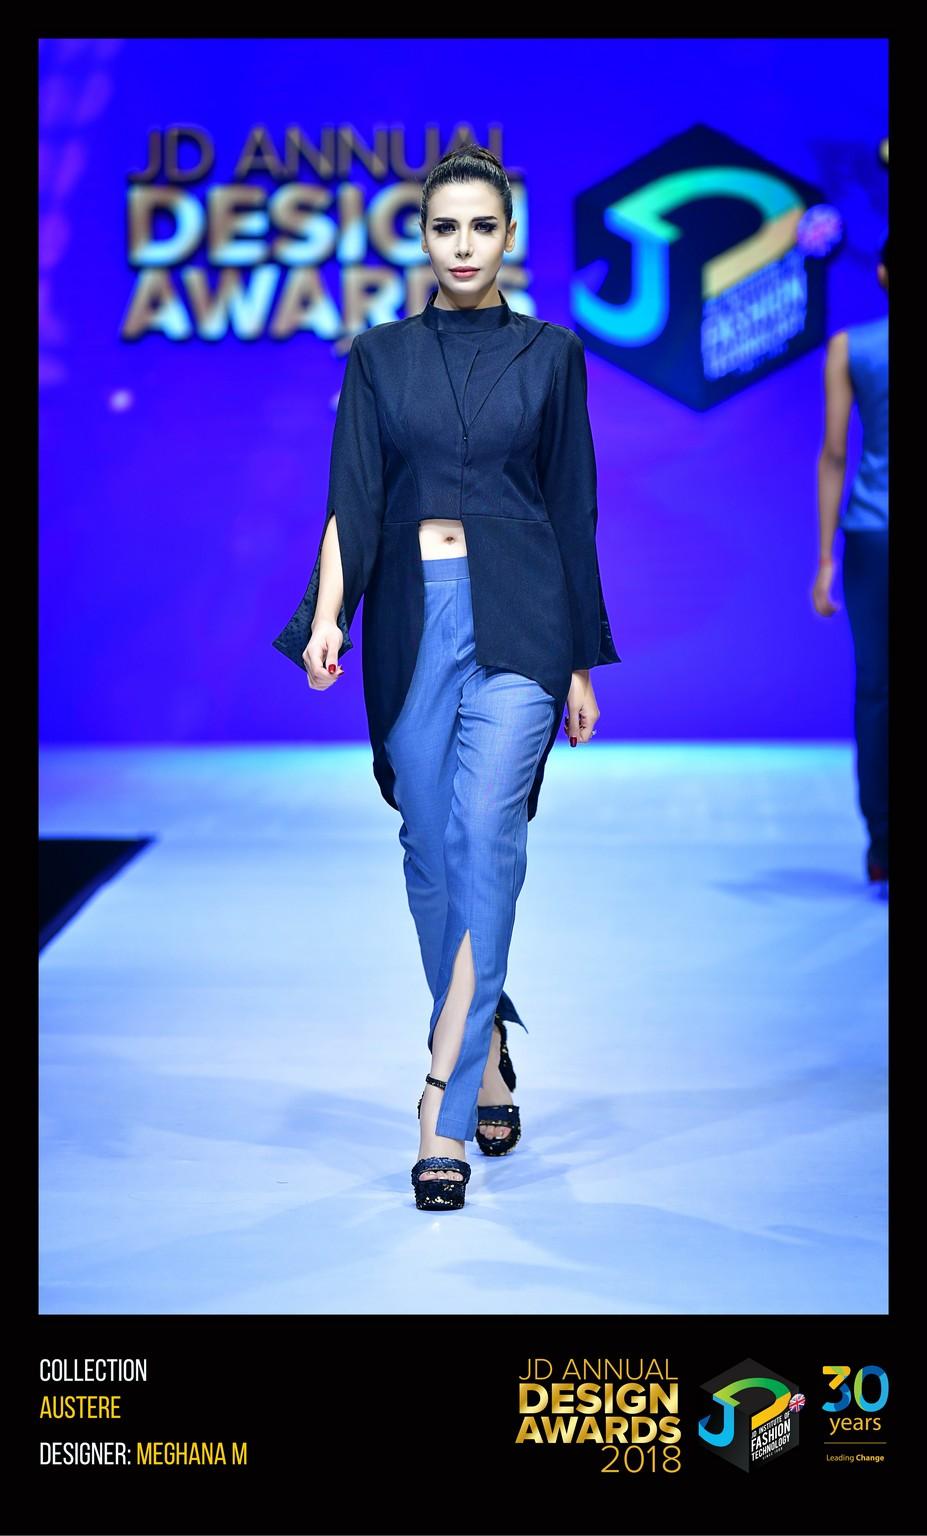 Austere – Change – JD Annual Design Awards 2018   Designer: Meghana   Photography : Jerin Nath (@jerin_nath) austere - AUSTERE8 - Austere – Change – JD Annual Design Awards 2018